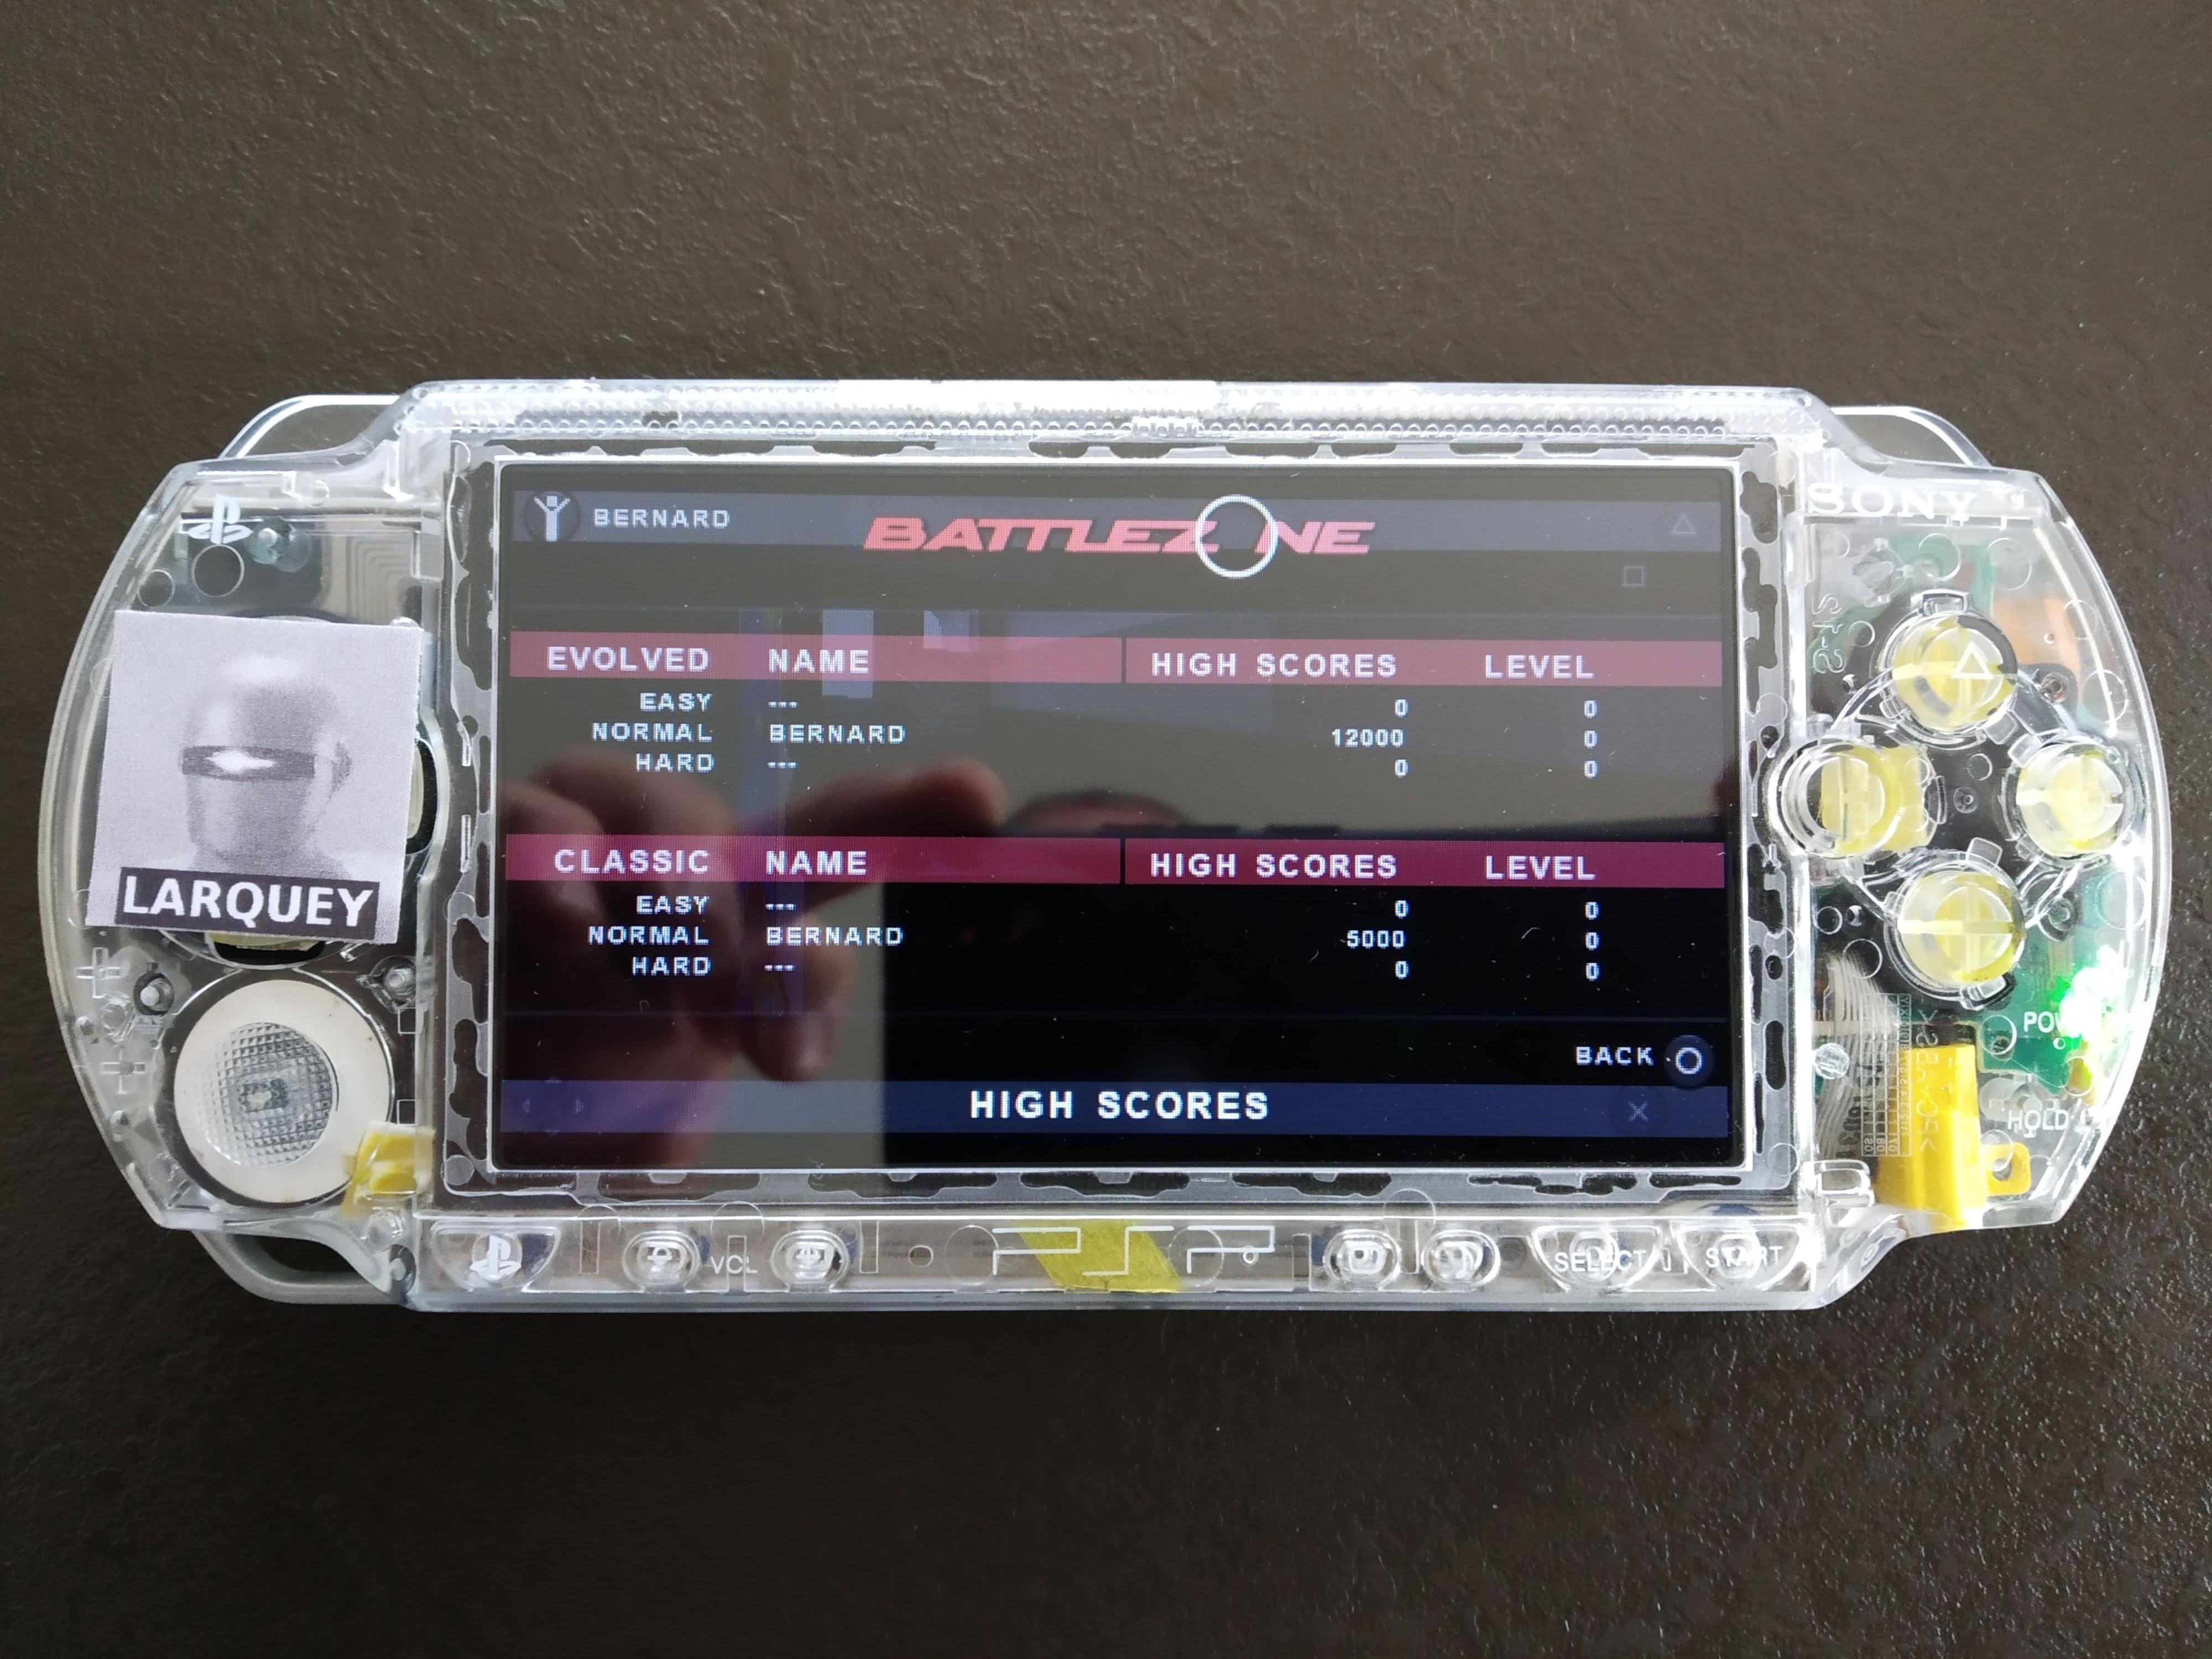 Larquey: Atari Classics Evolved: Battlezone [Evolved] (PSP) 12,000 points on 2019-12-26 17:11:14